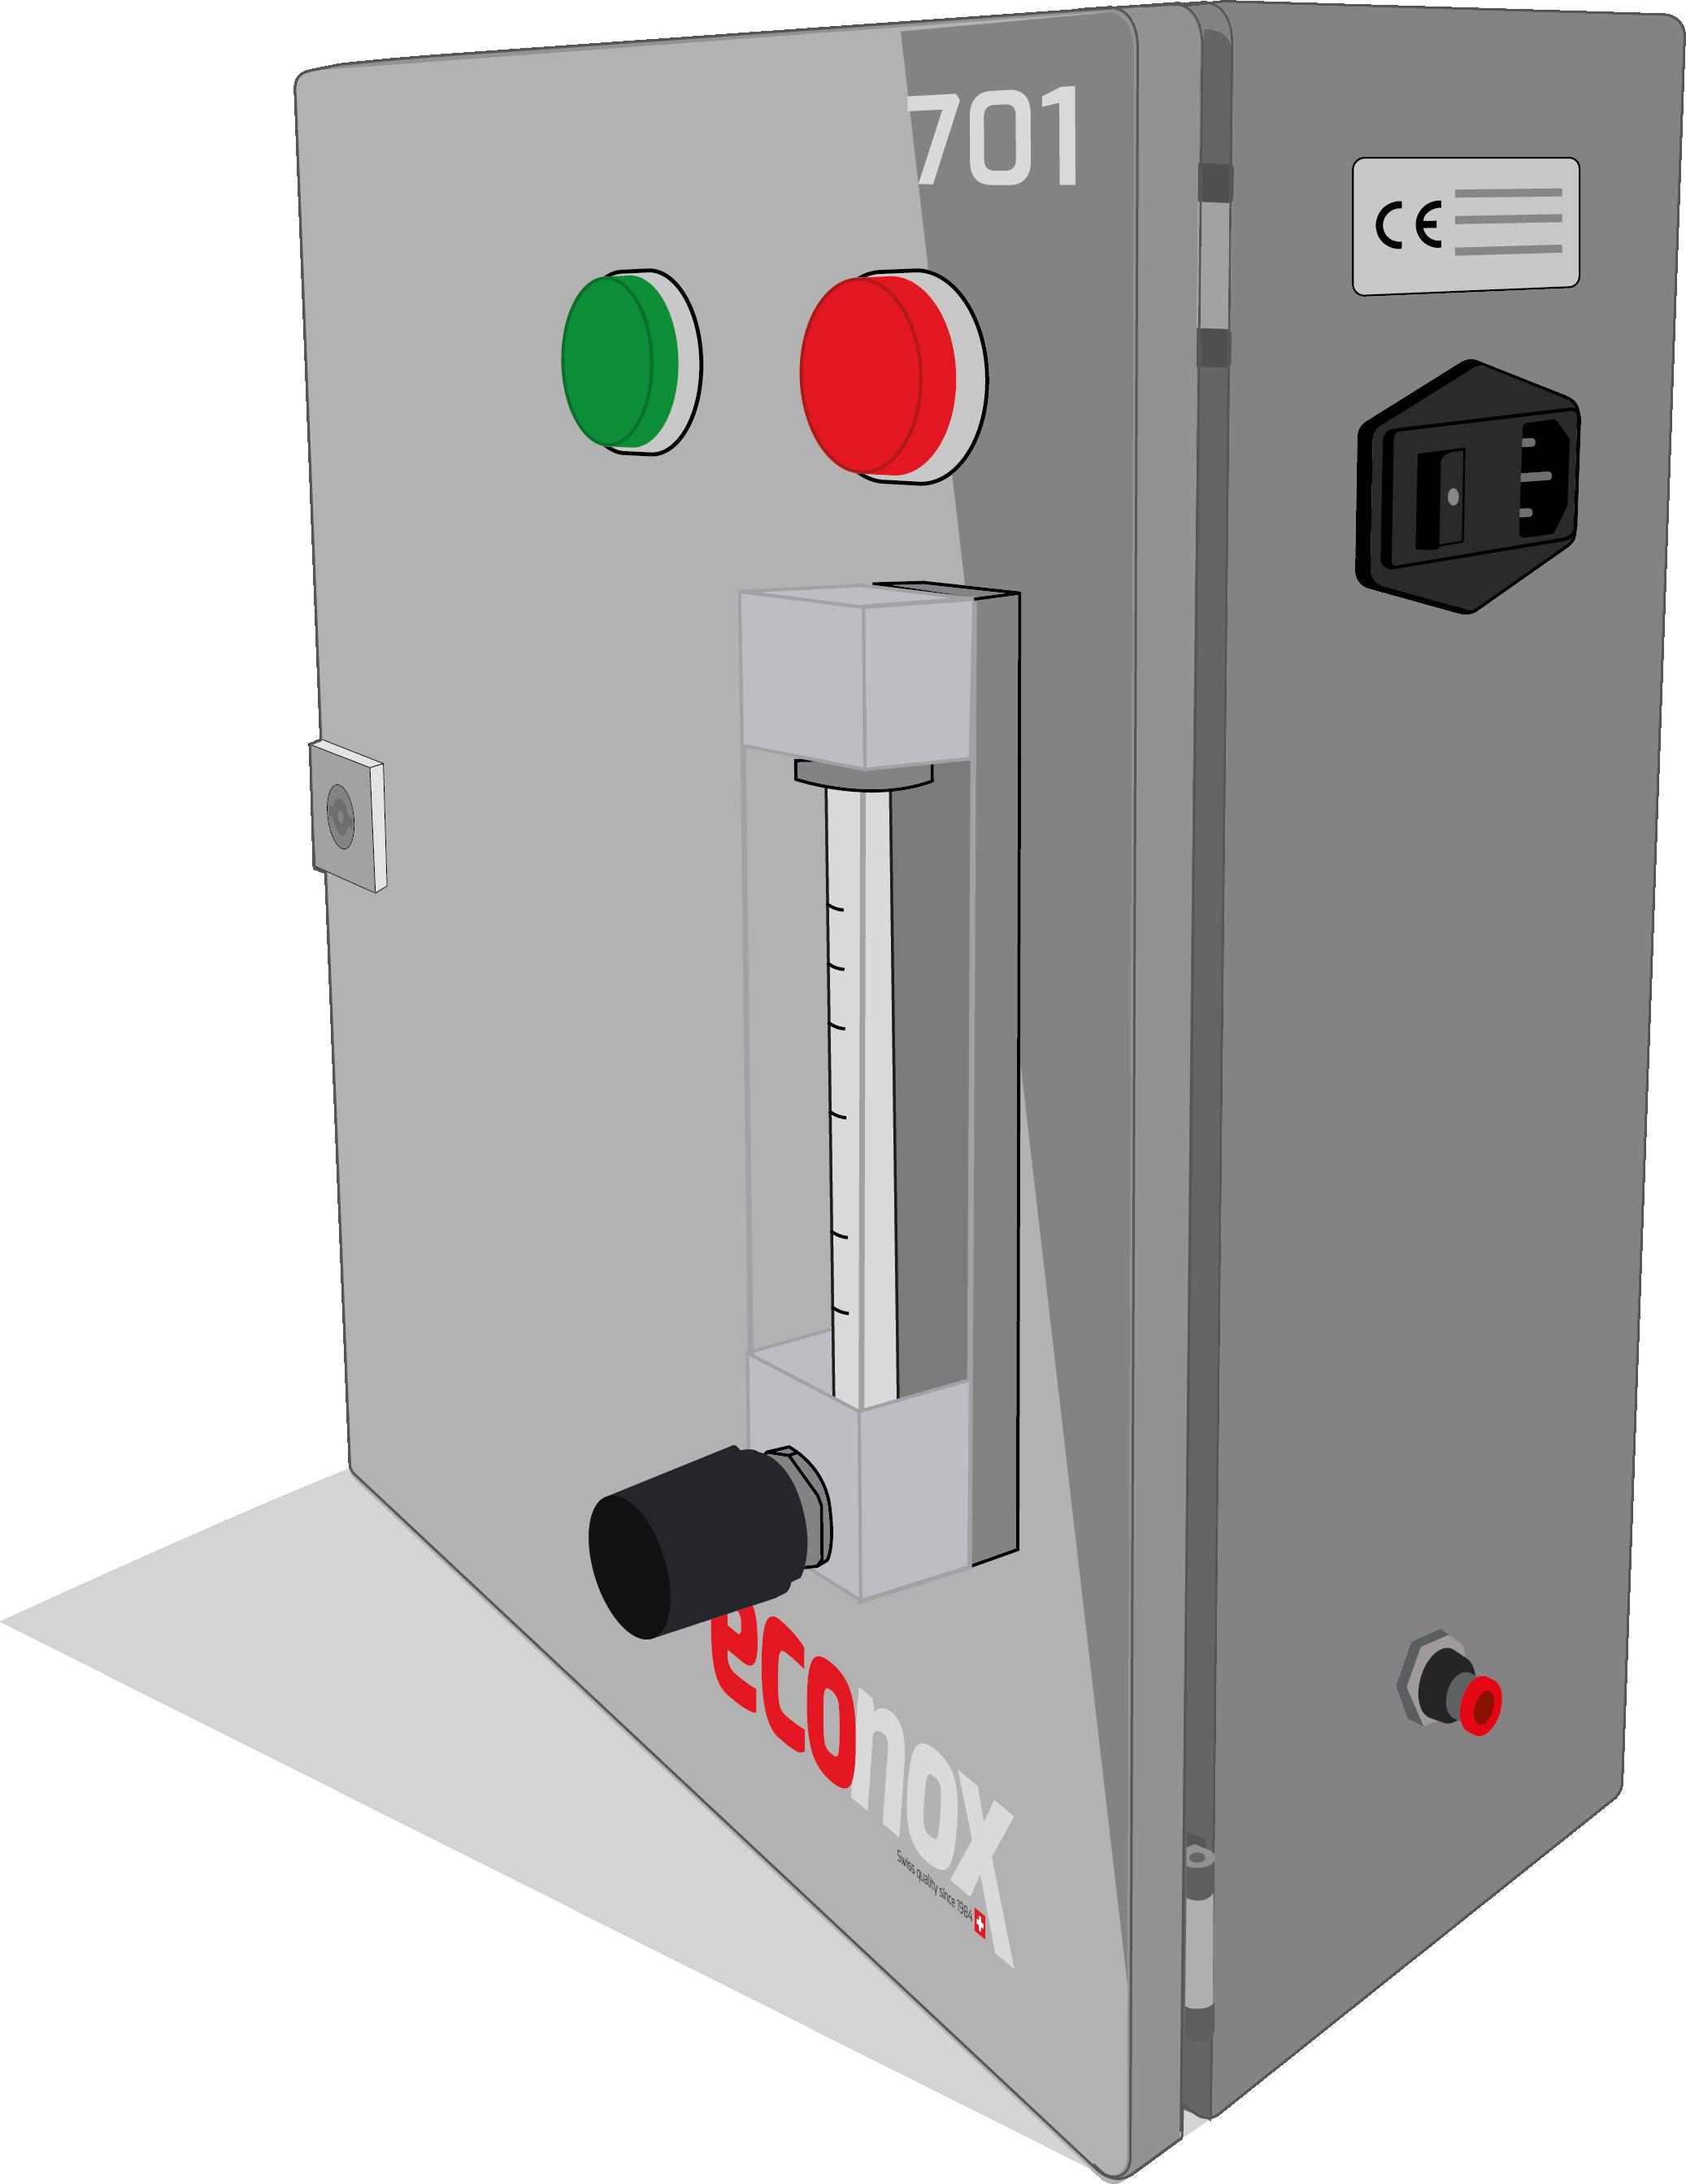 Maintenance Module 701